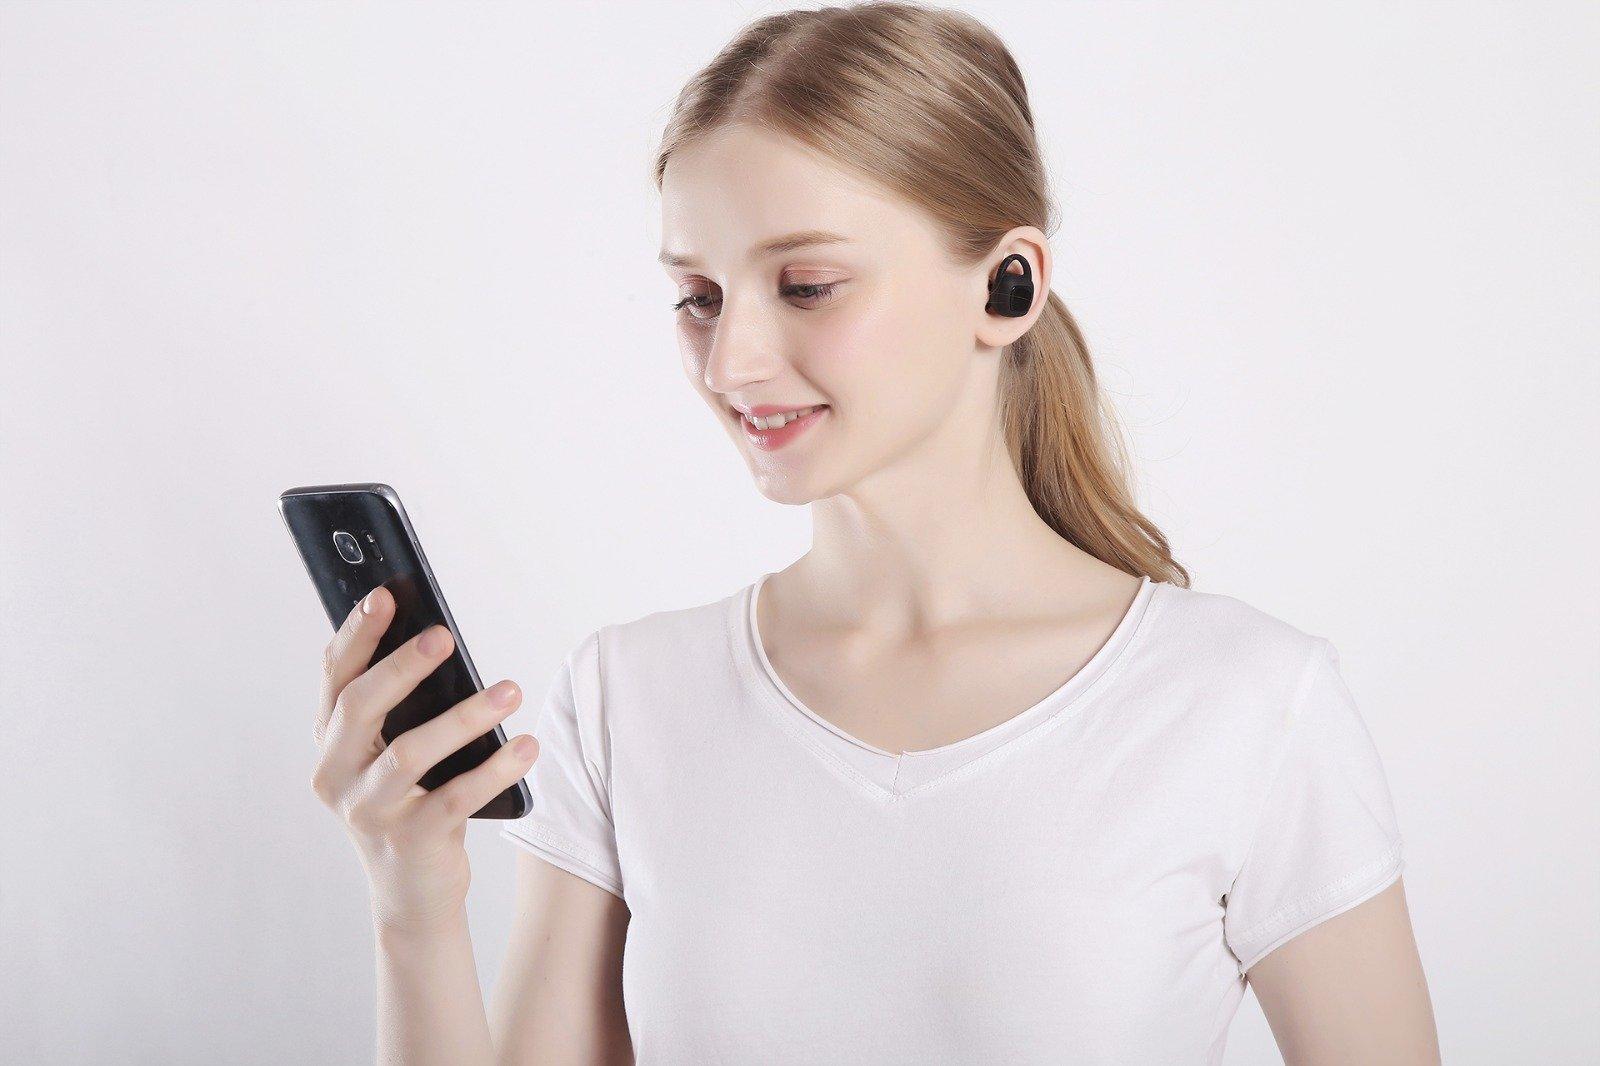 xFyro Aria earbuds-women